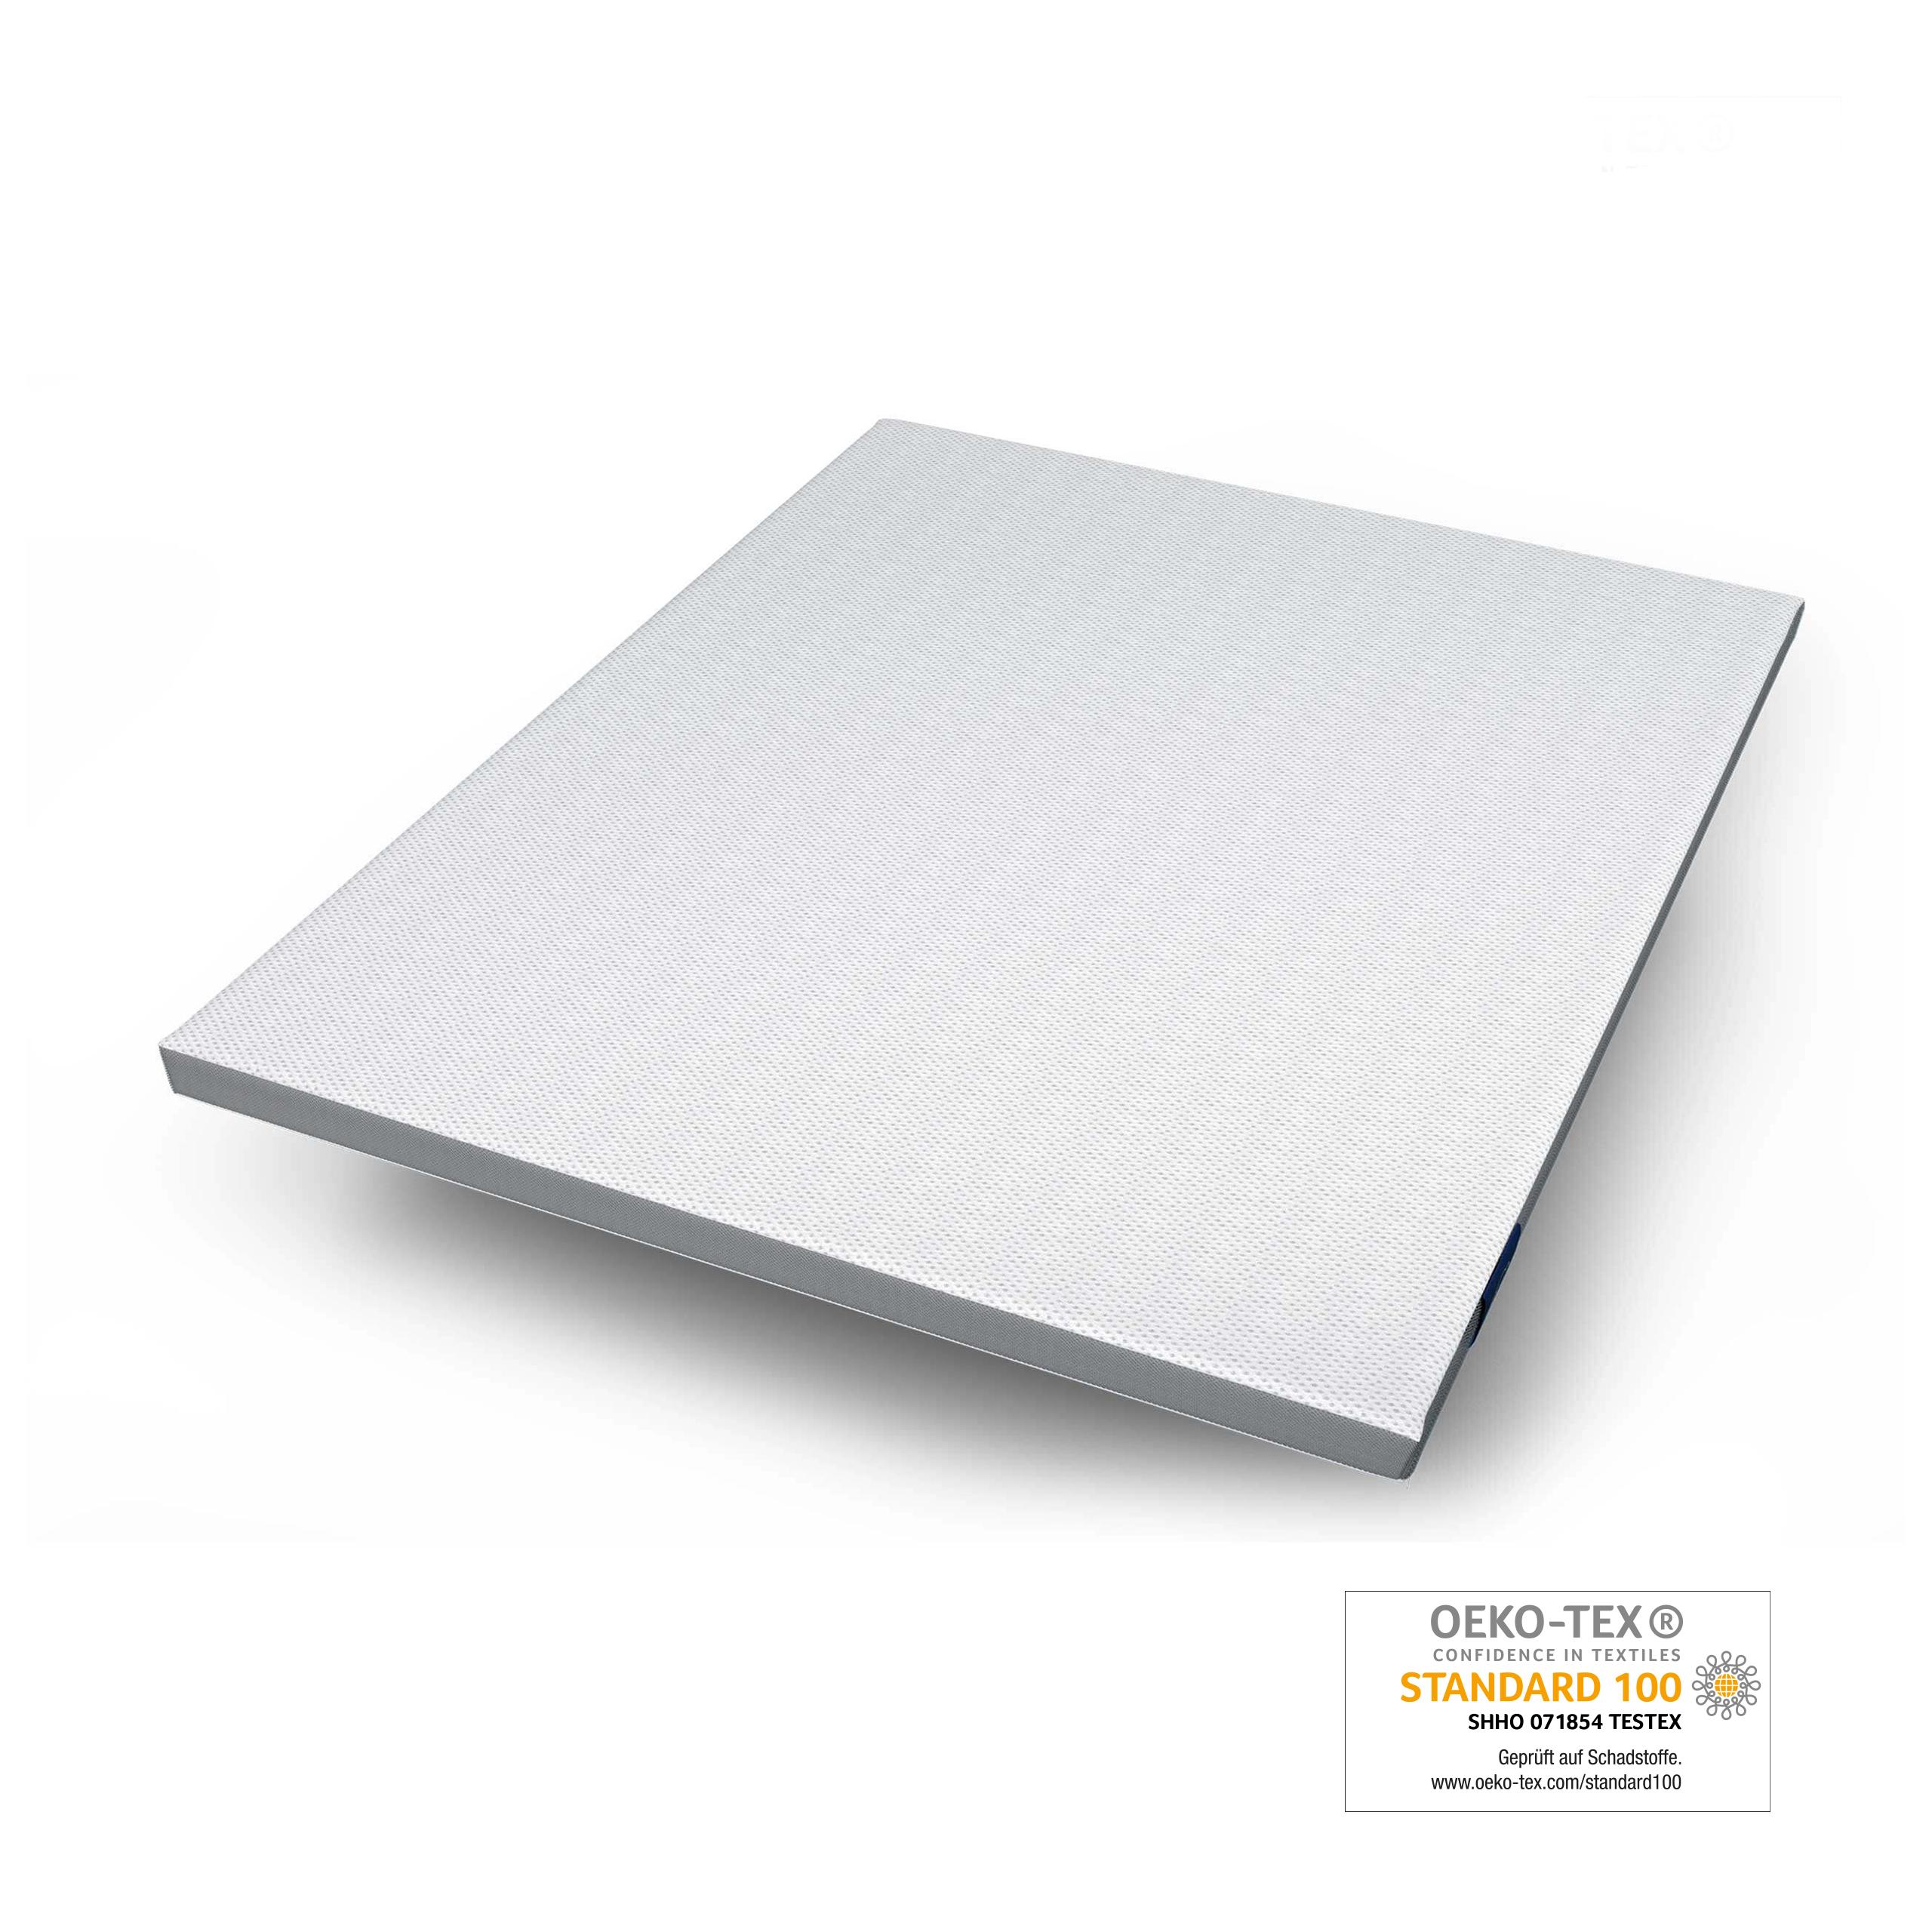 Genius eazzzy | Matratzentopper 180 x 200 x 7 cm A19206